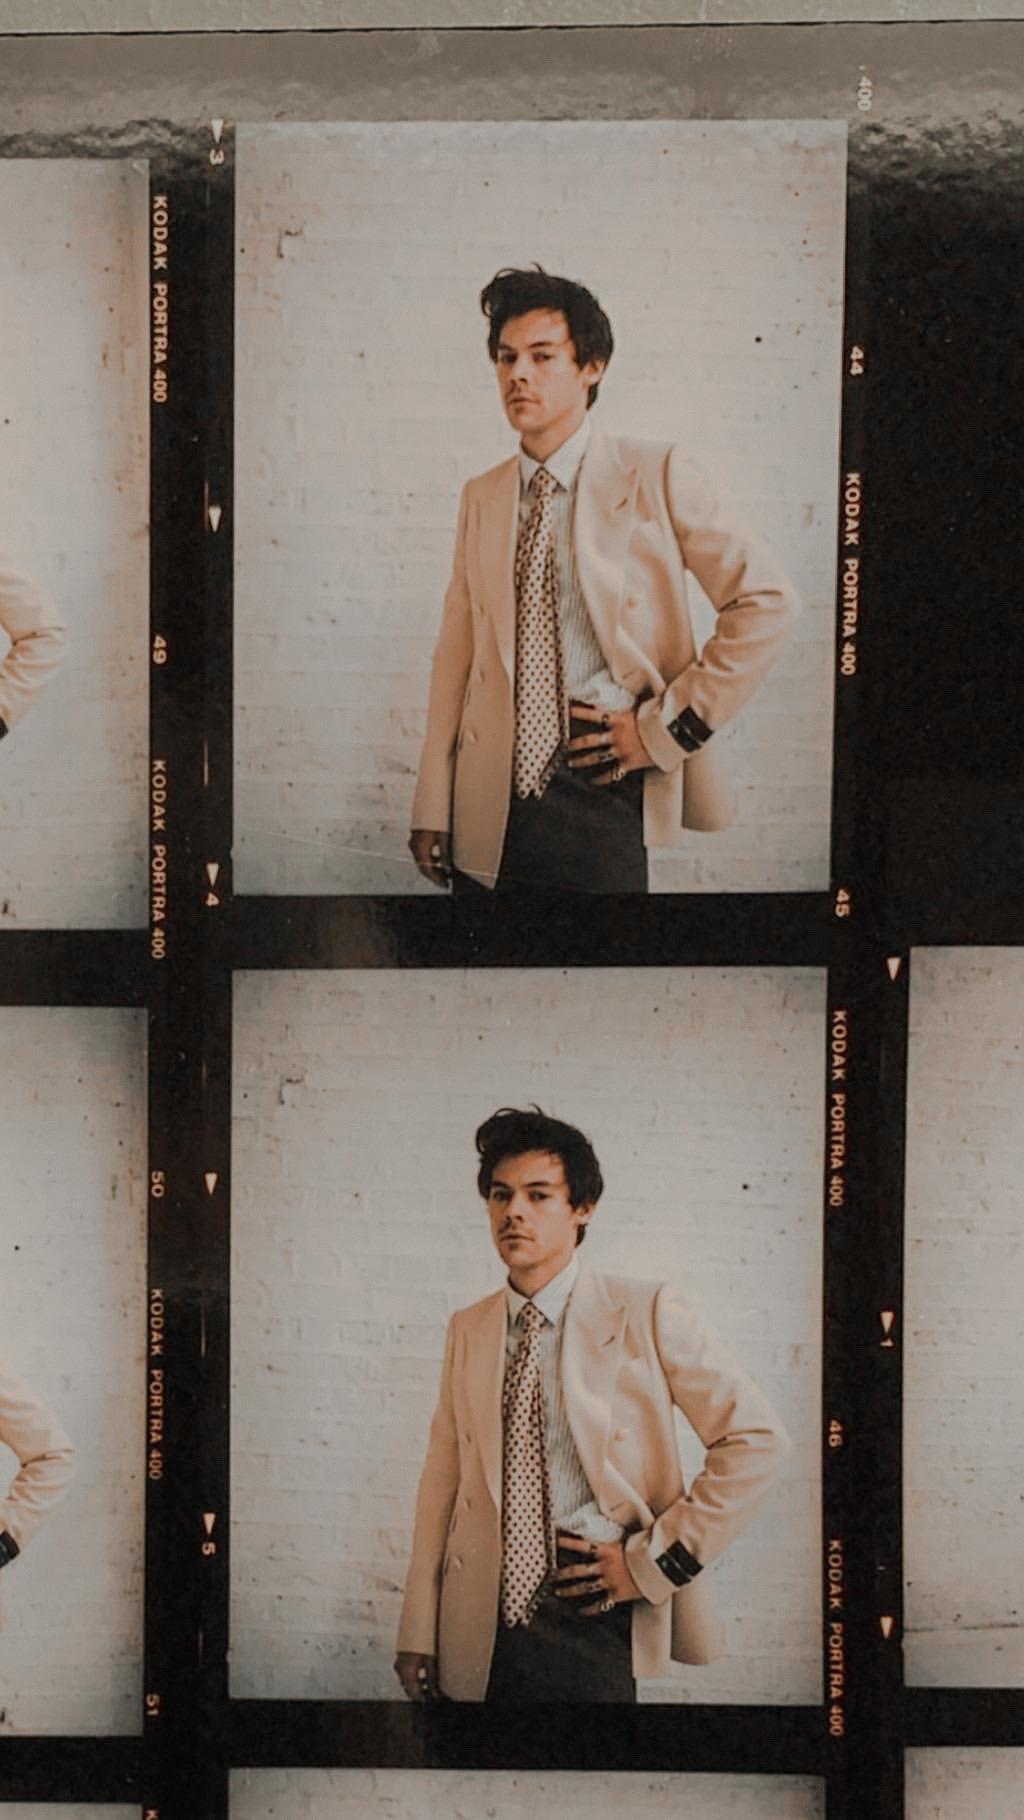 P I N T R E S T Annakhammes In 2020 Harry Styles Lockscreen Harry Styles Photoshoot Harry Styles Wallpaper